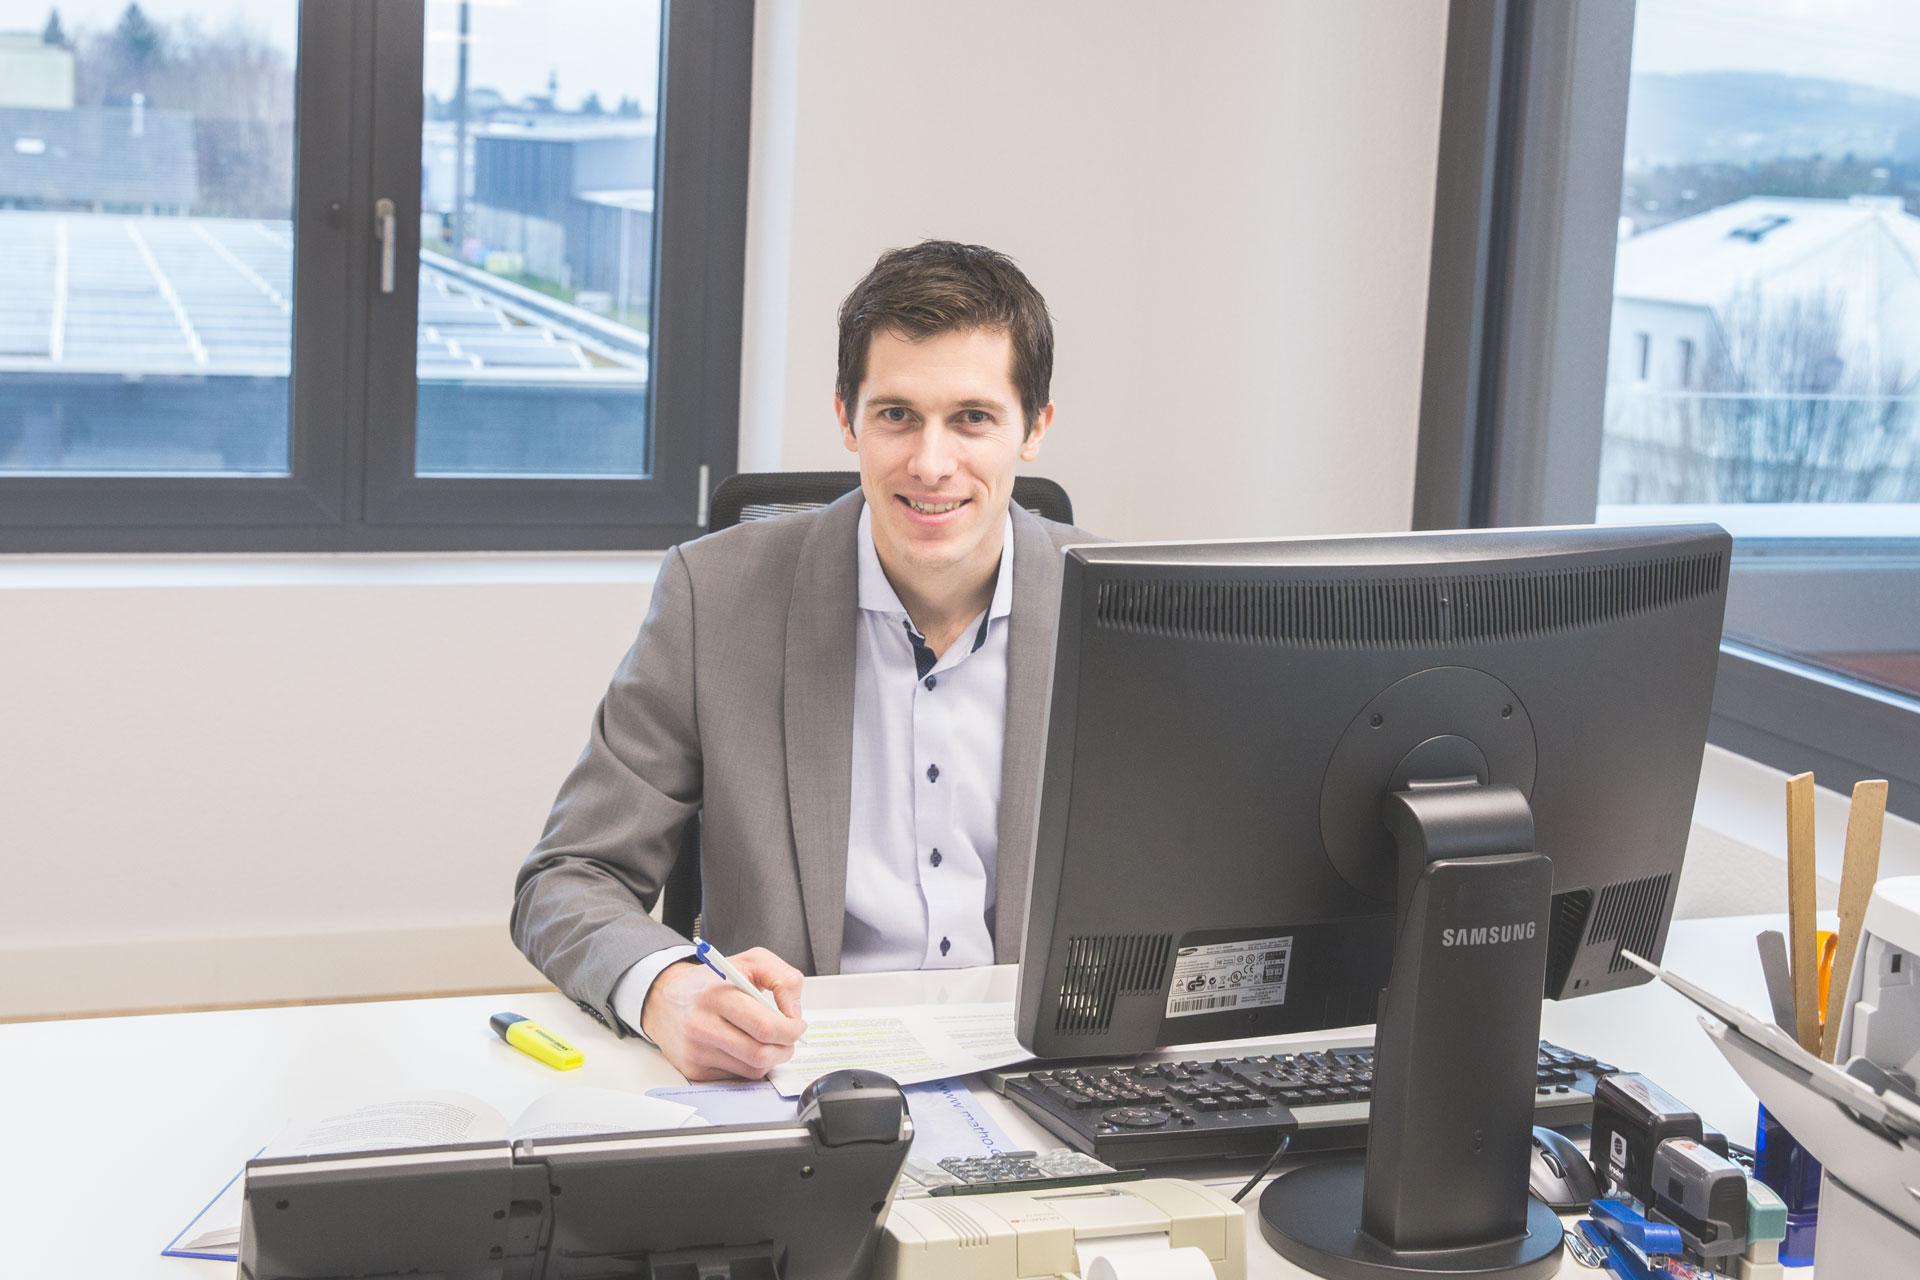 Christian Hufschmid Litrag und Partner AG